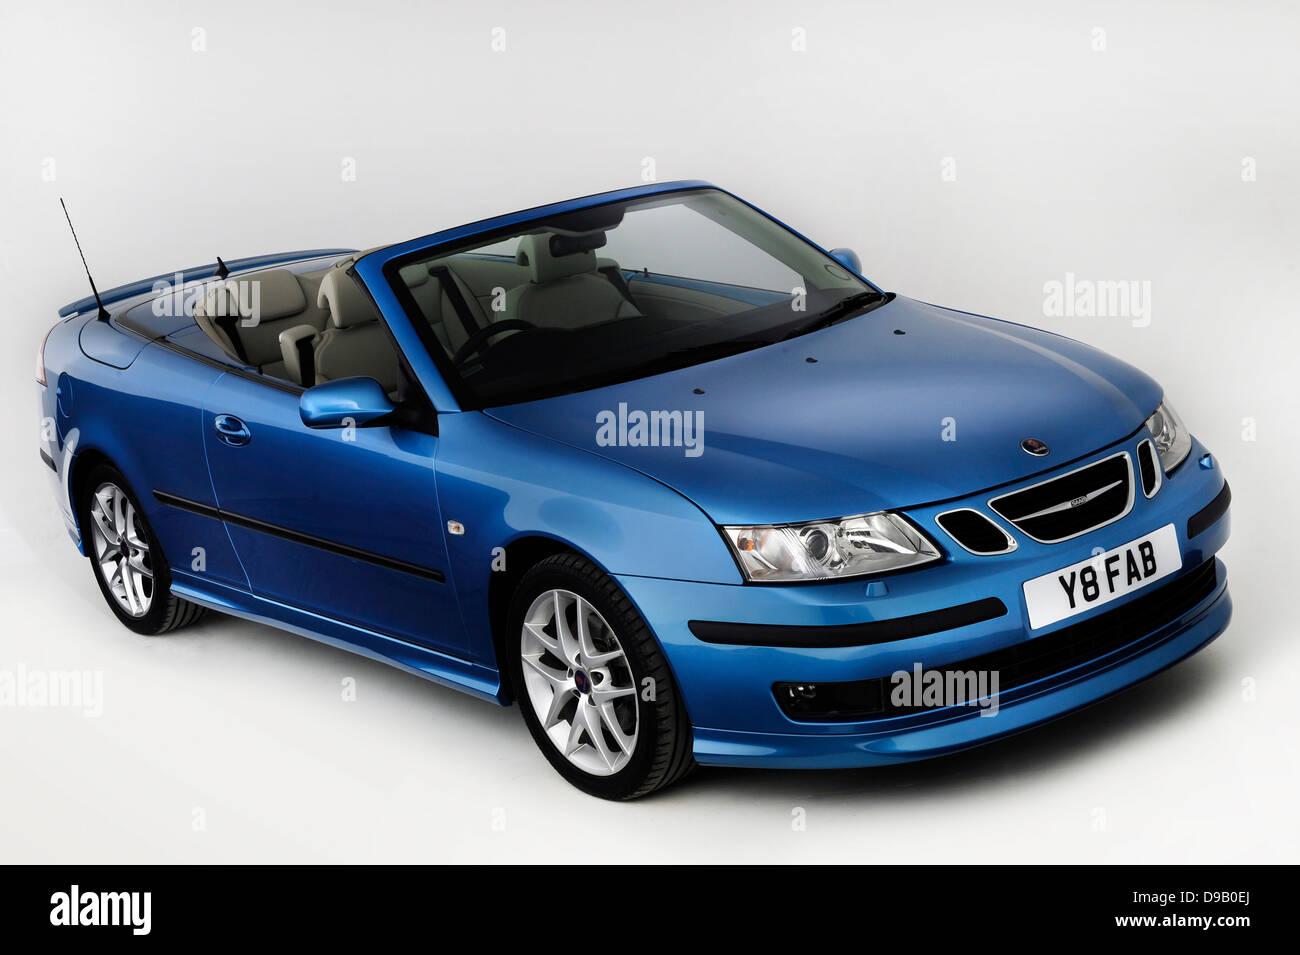 2007 Saab 9-3 Cabriolet - Stock Image